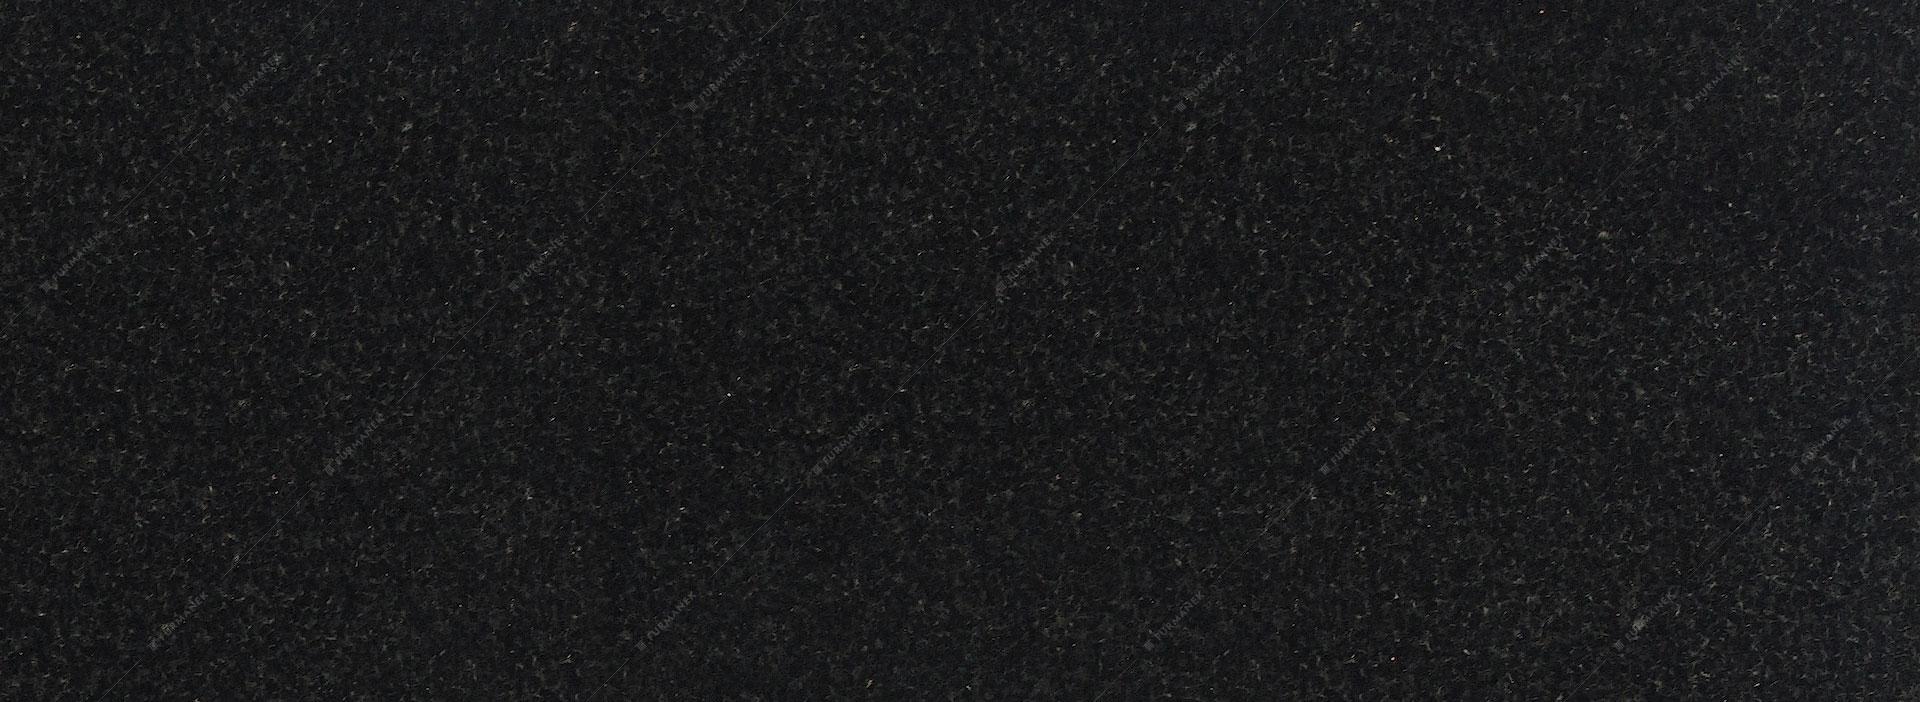 Absolute Black